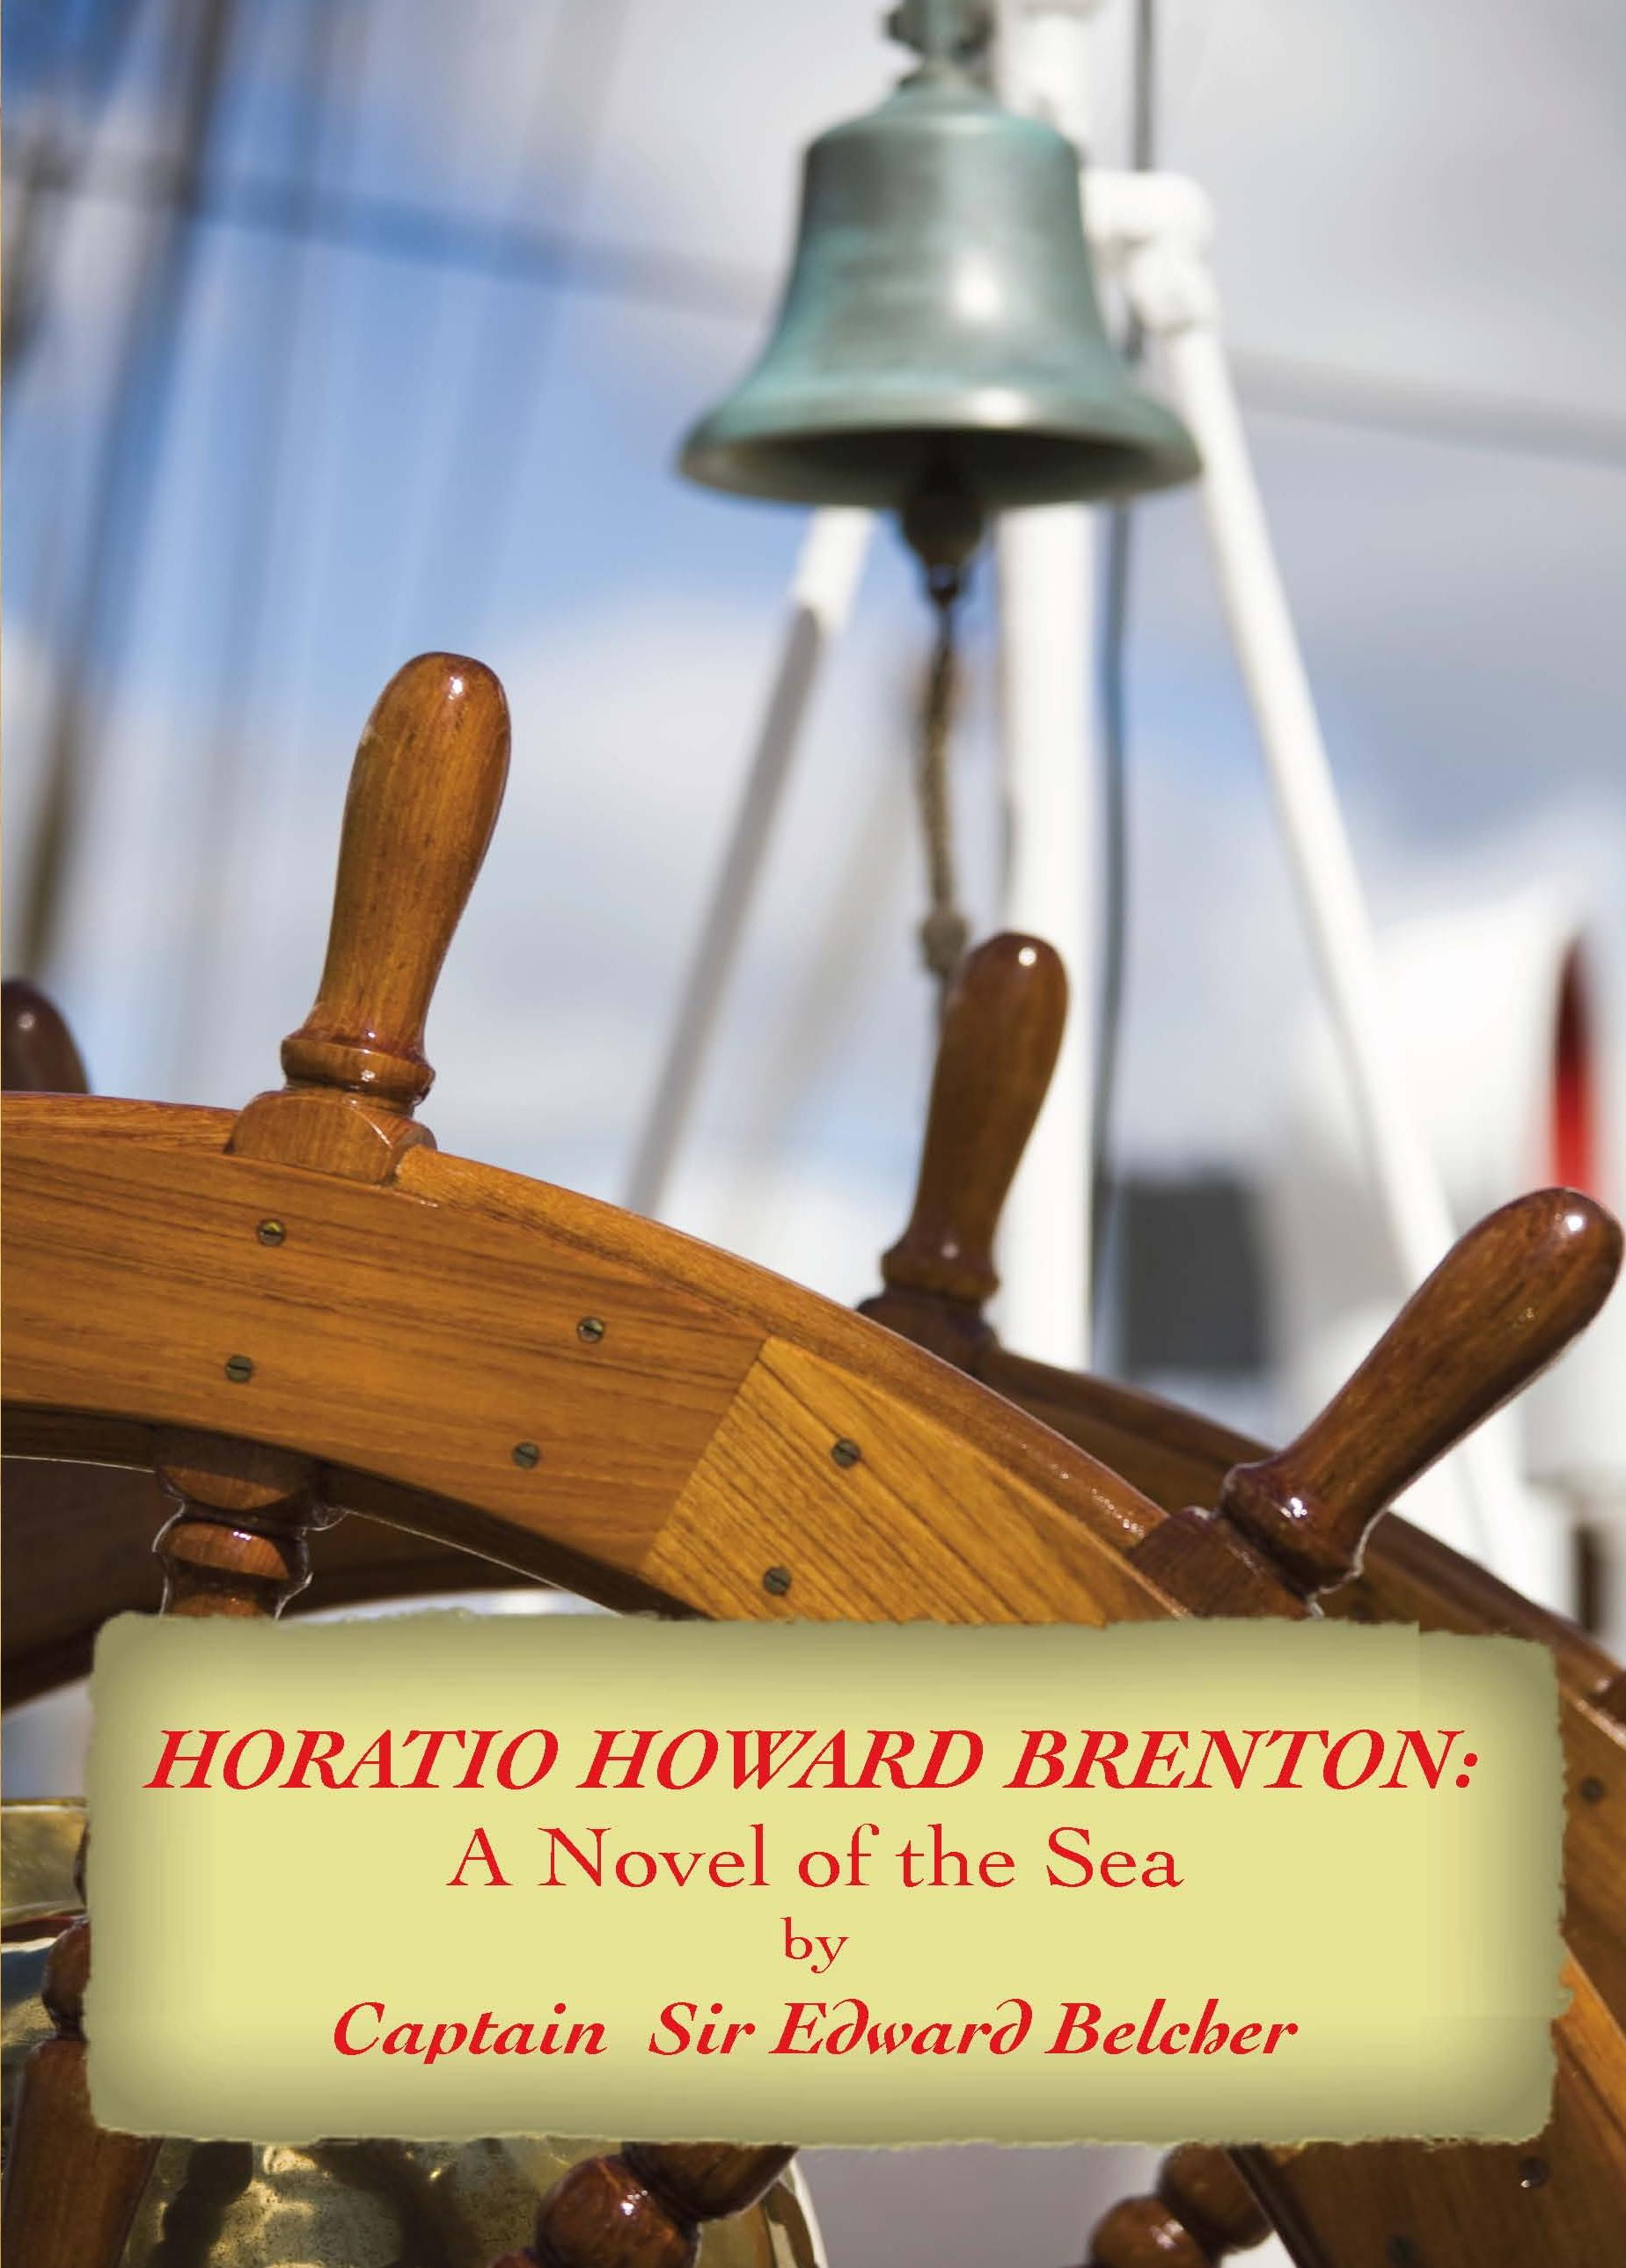 Horatio Howard Brenton: A Novel of the Sea EB9781611790597